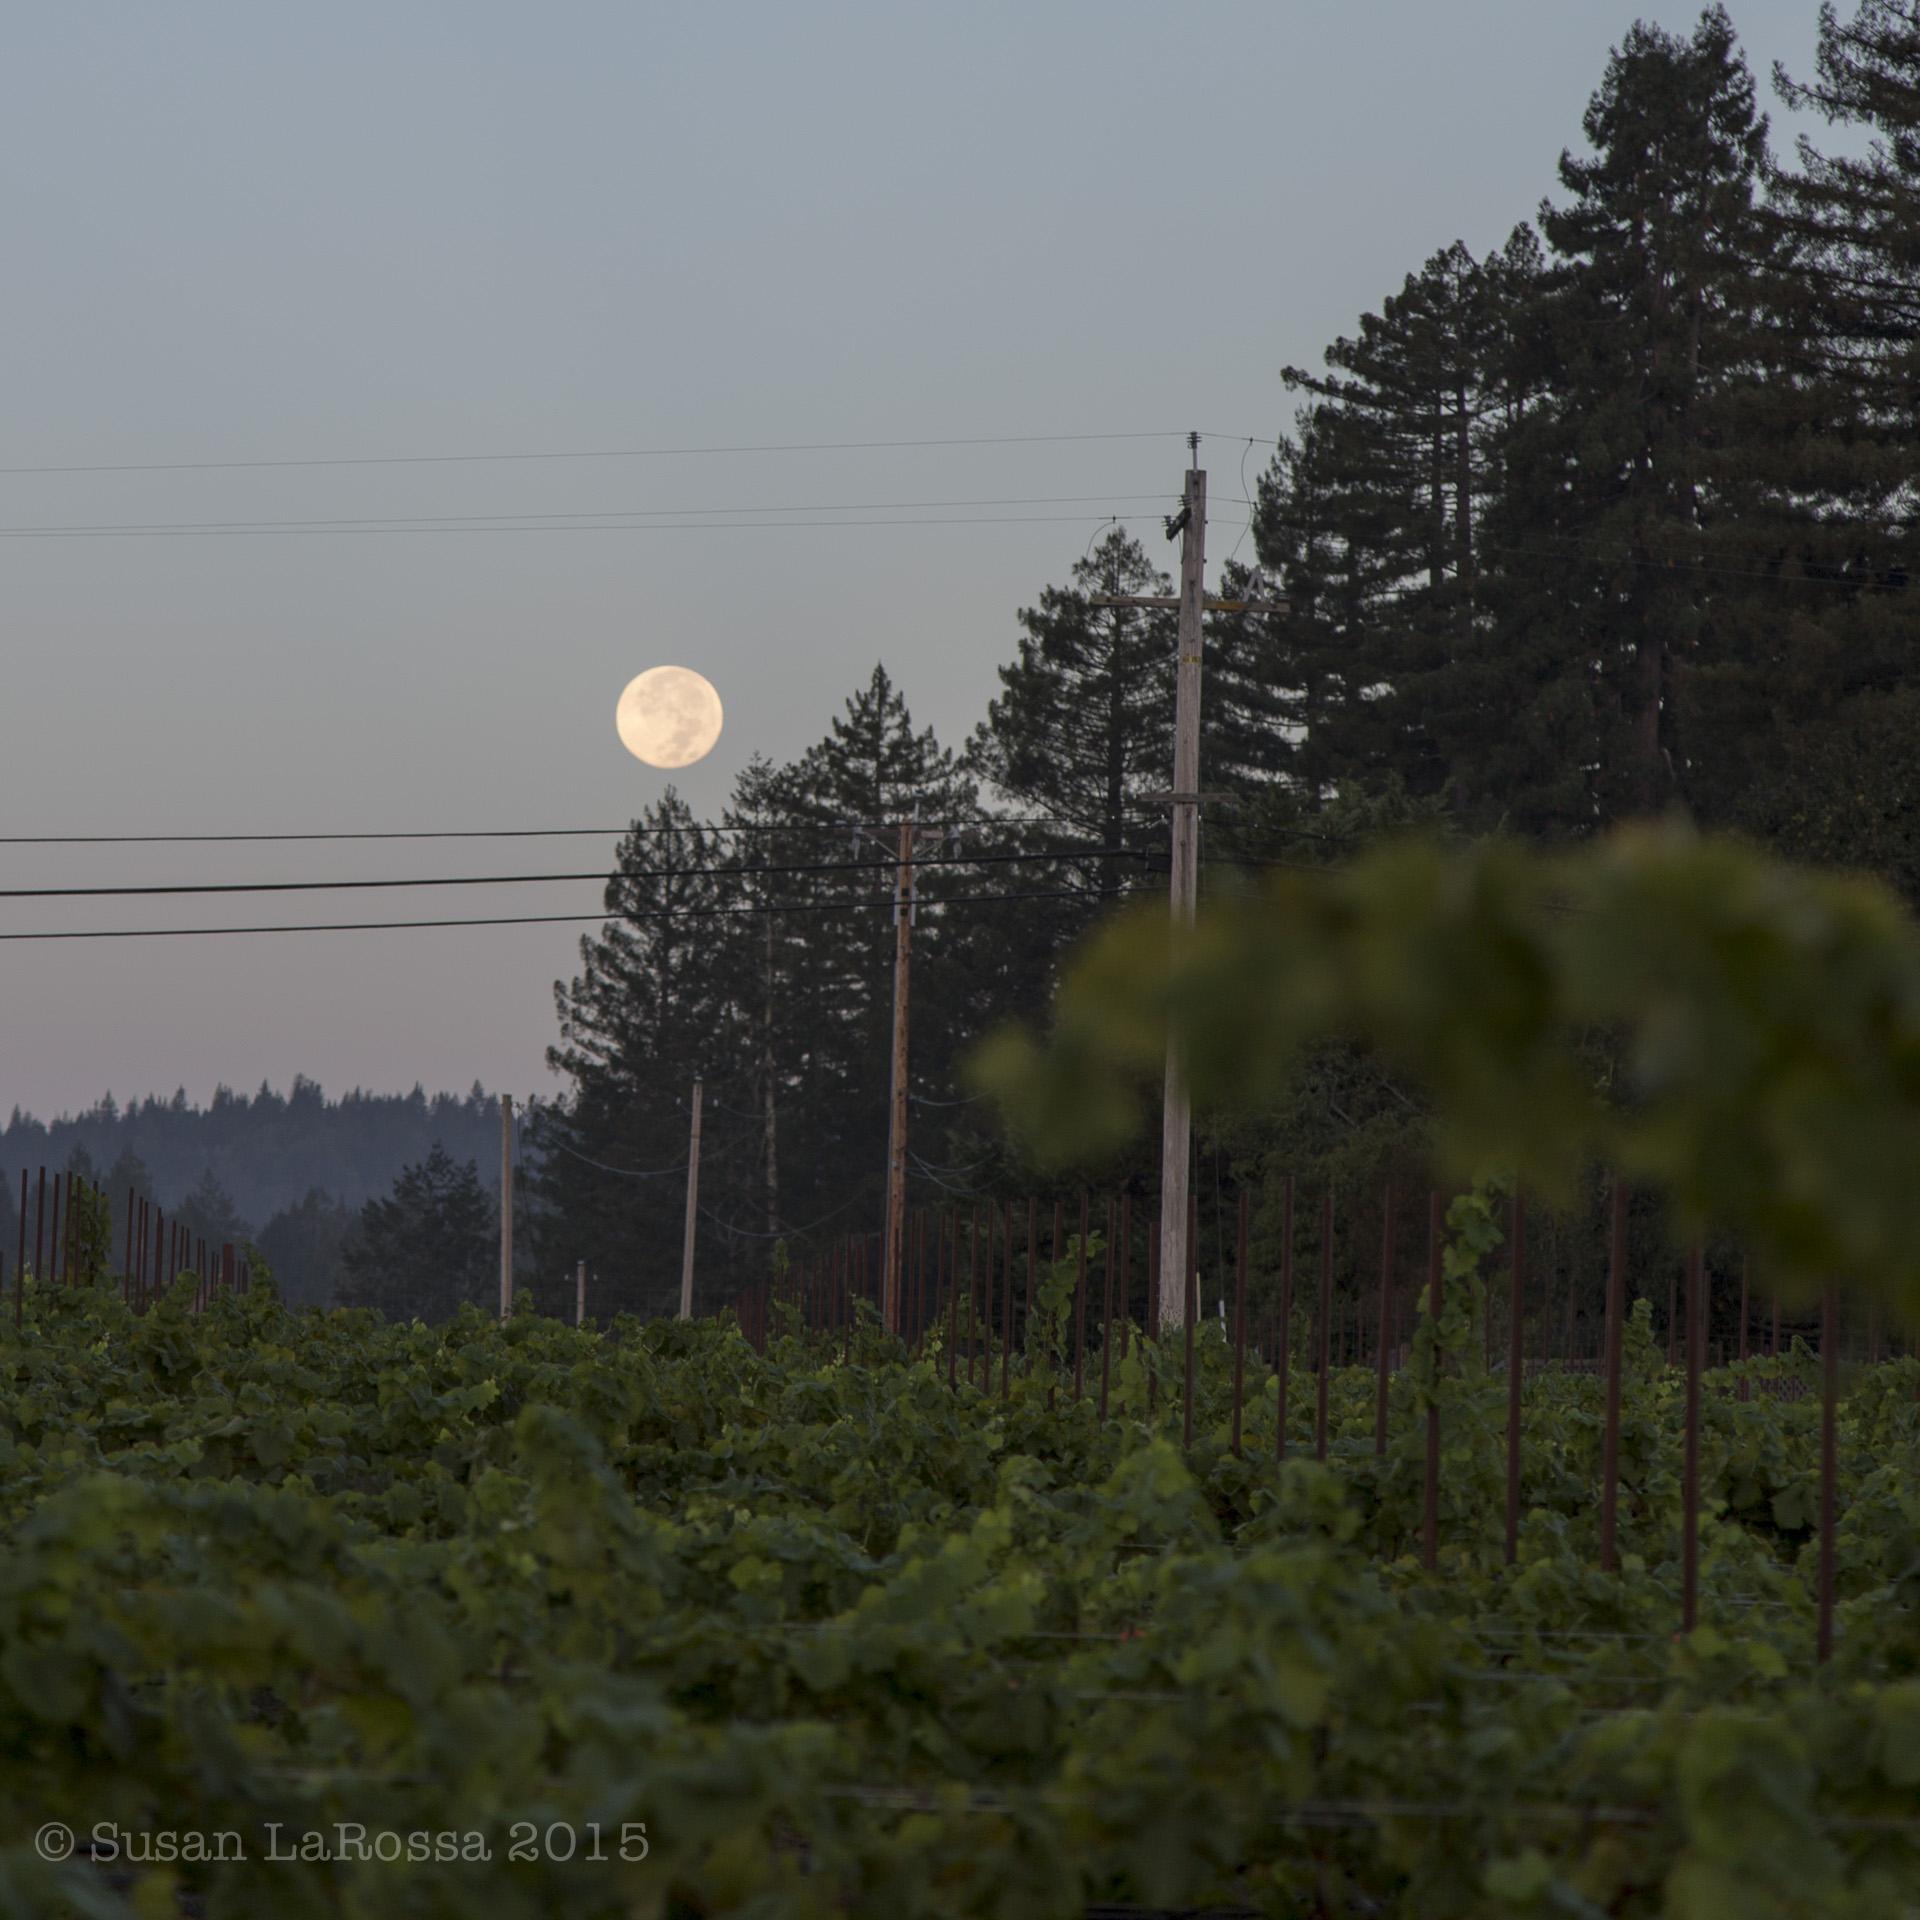 Picking the Radio-Coteau estate vineyard under a setting full moon